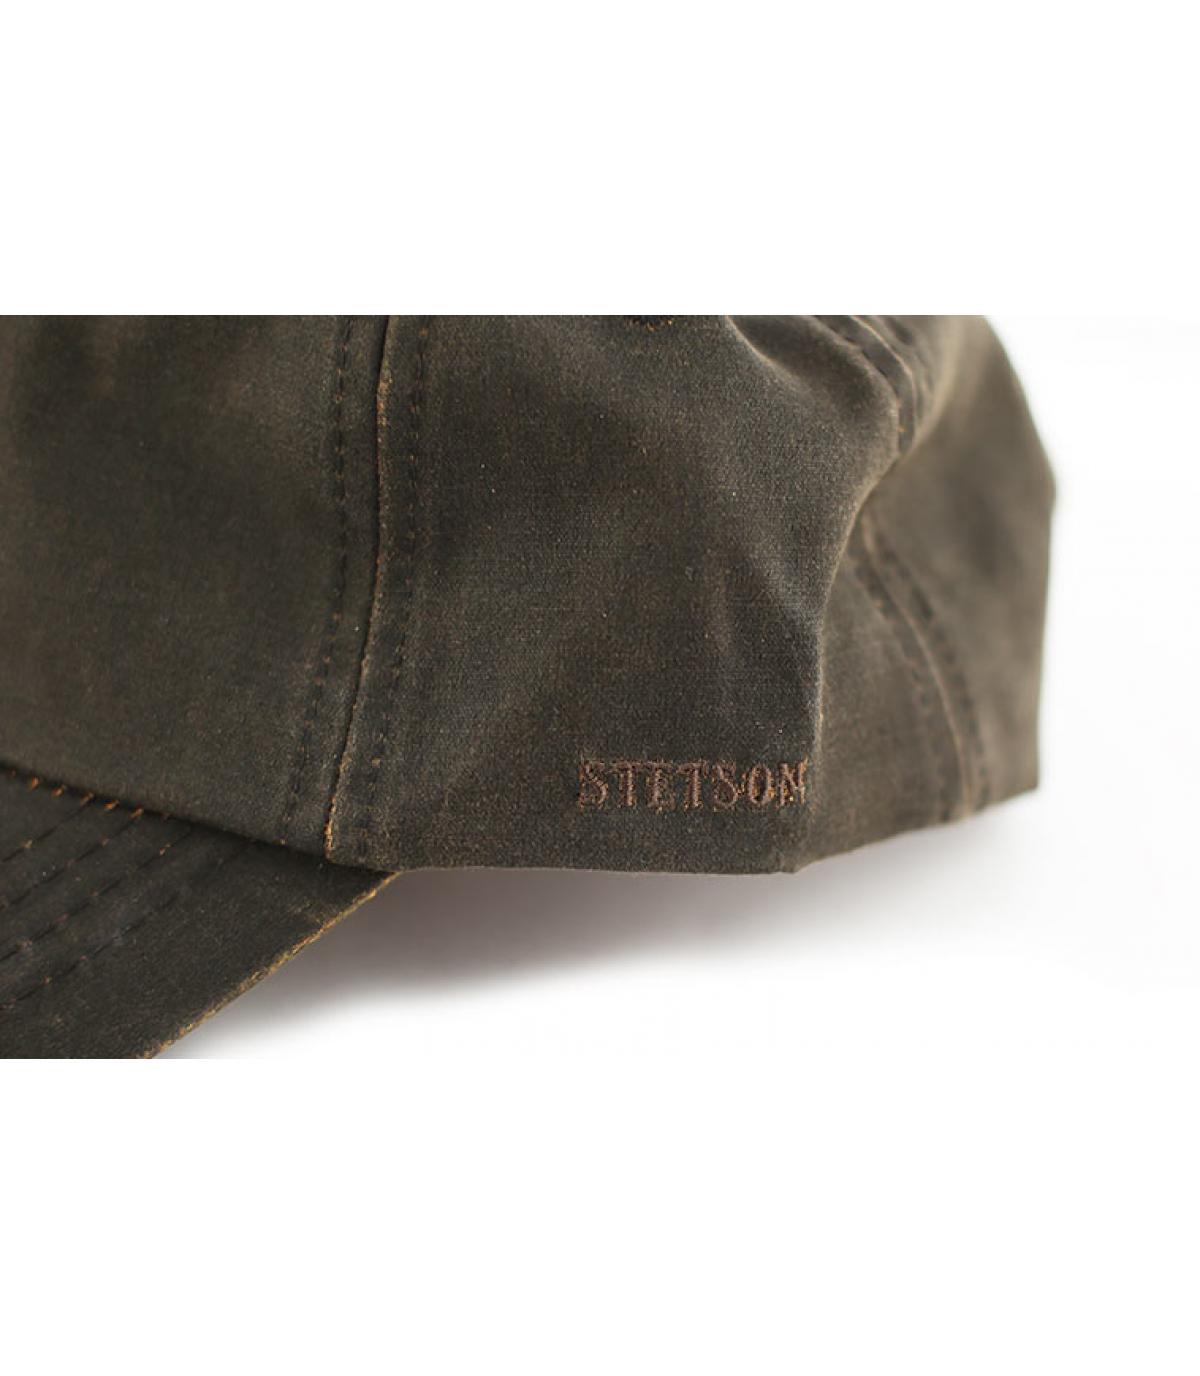 Details Statesboro brown - Abbildung 3